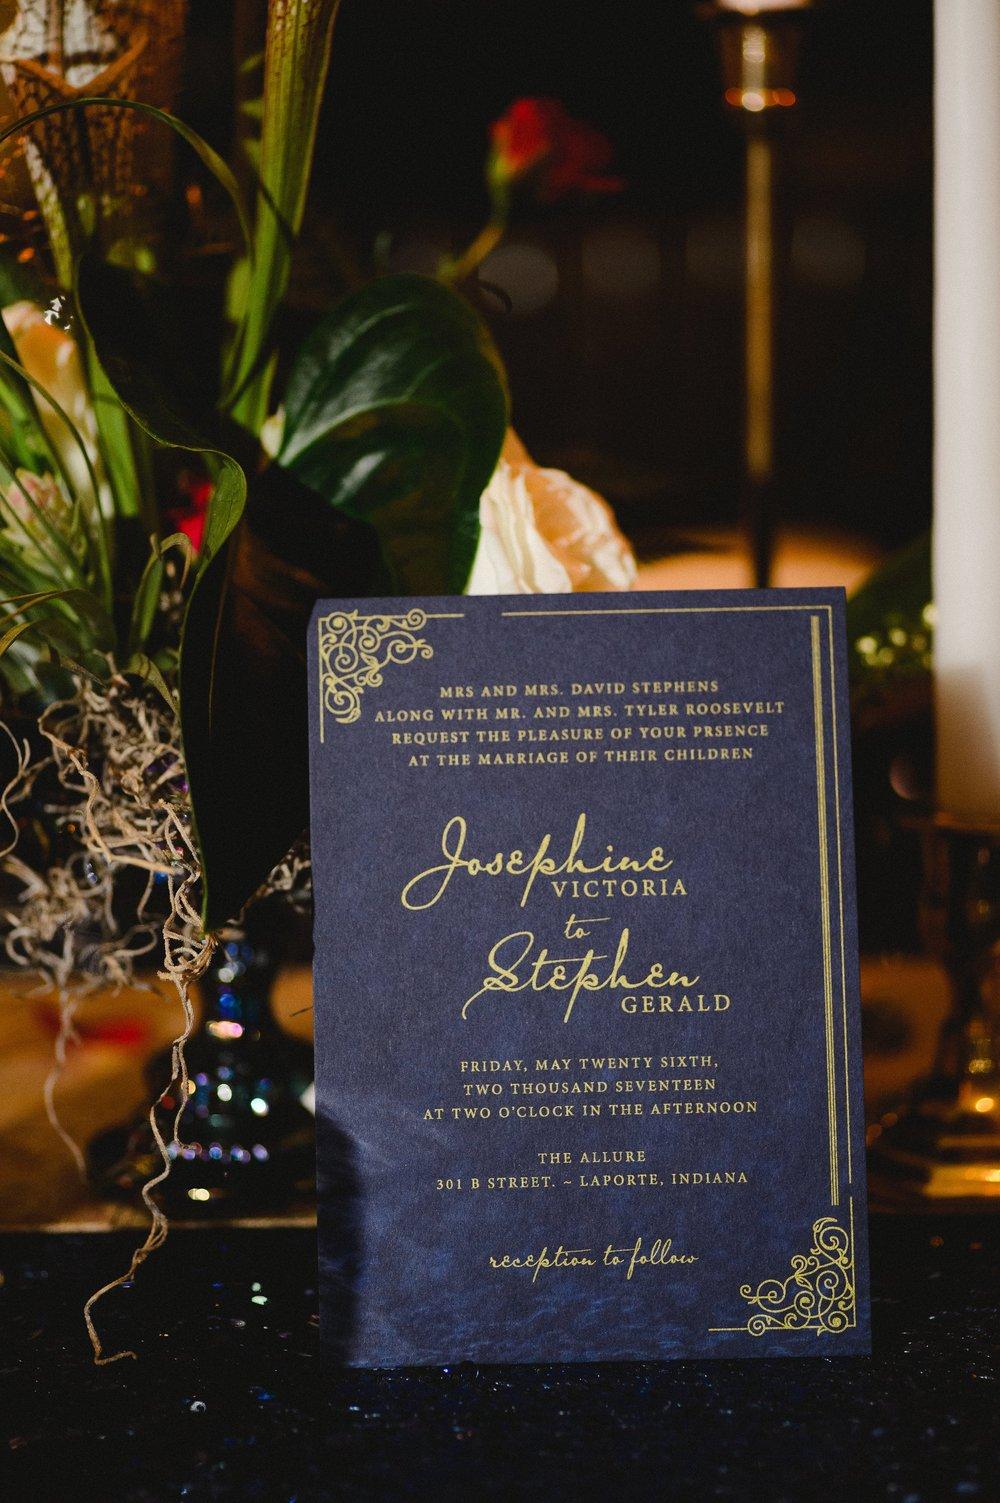 KatherineMurrayPhotography_StyledShoot_Wedding_BeautyAndTheBeast_ATaleAsOldAsTime_theAllure_LaPorteIndiana00245-min.jpg